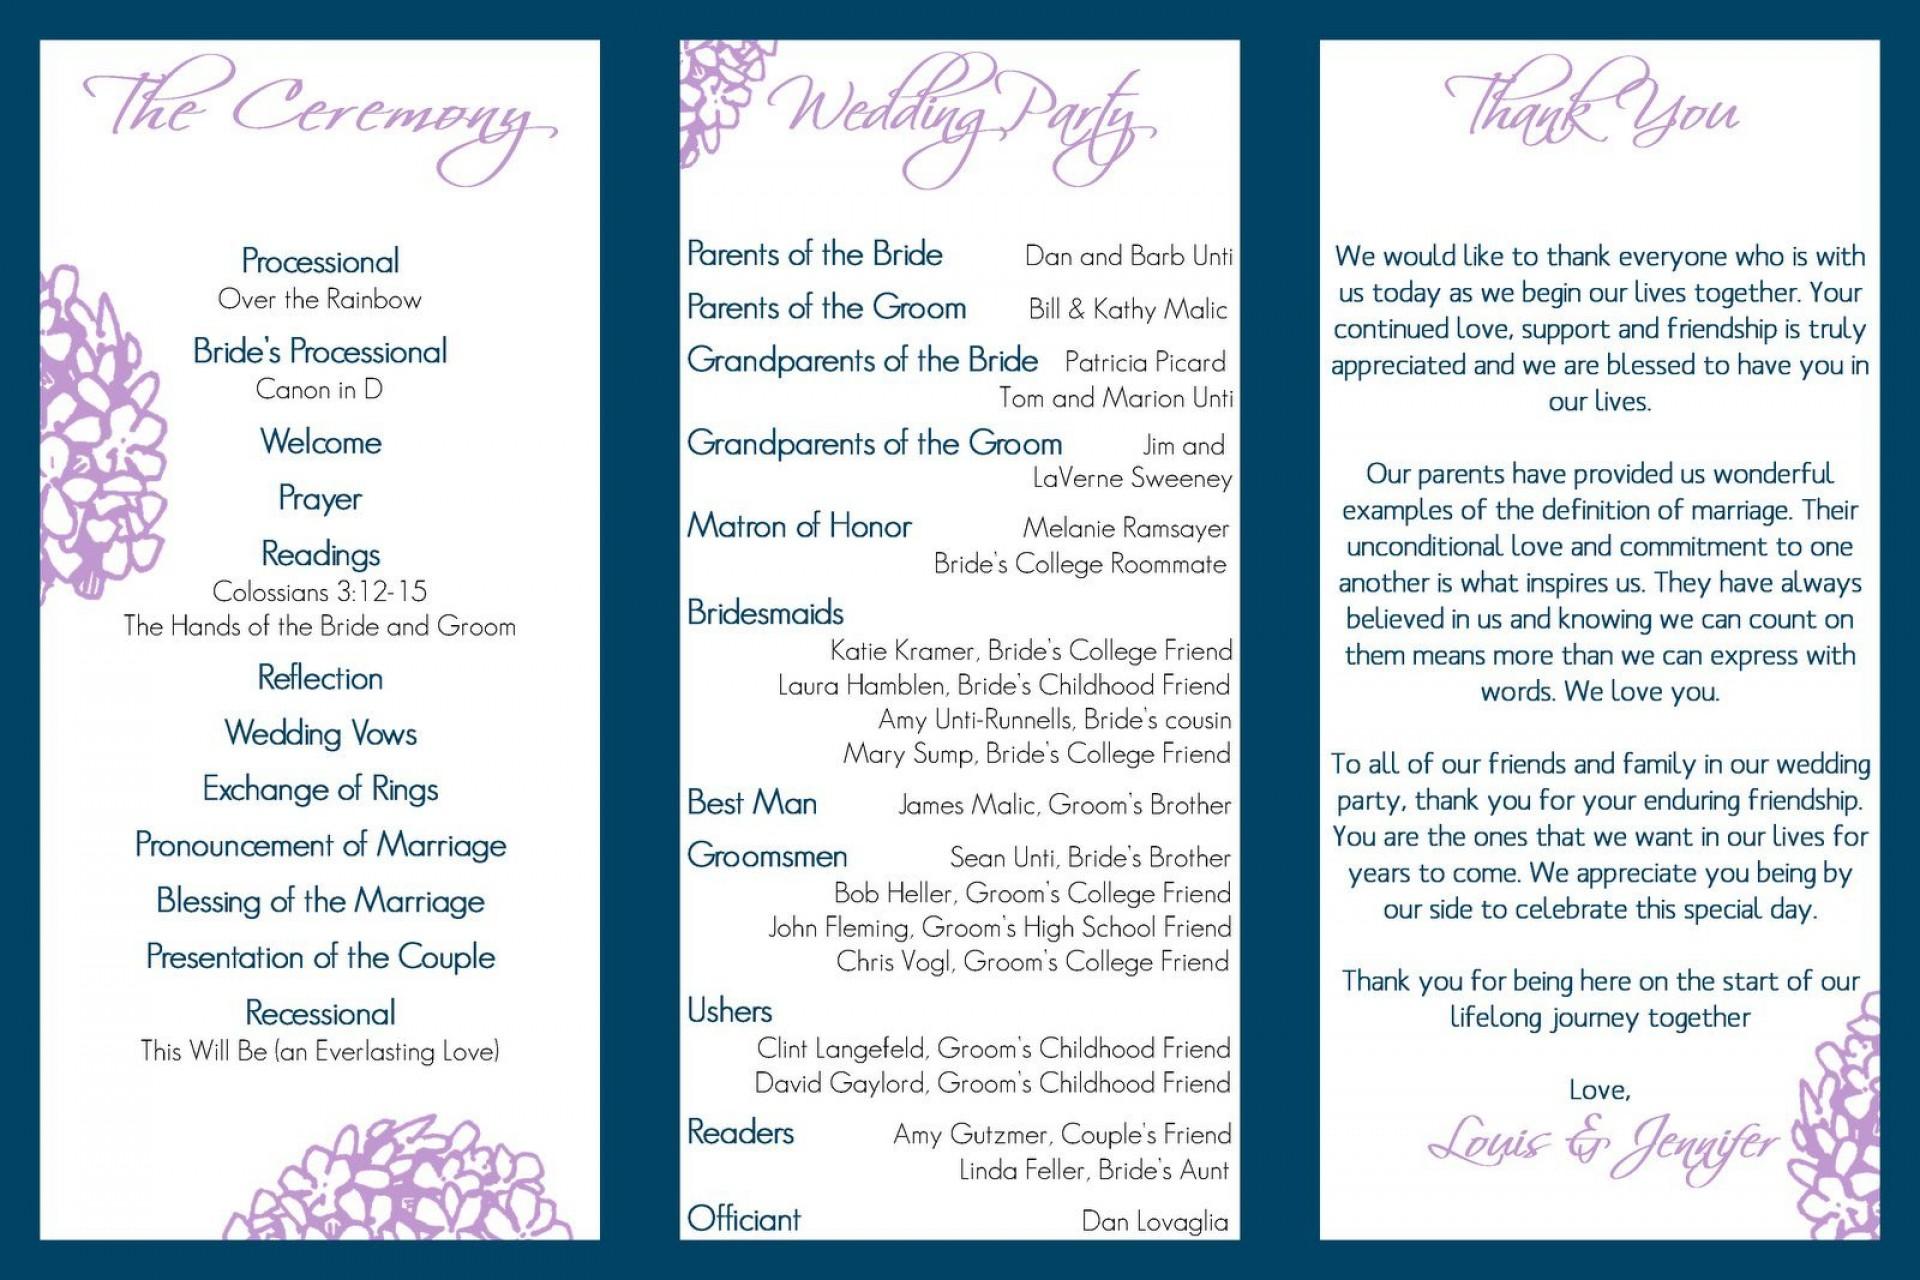 004 Stupendou Trifold Wedding Program Template Example  Templates Tri Fold Tri-fold Publisher Free Foldable1920